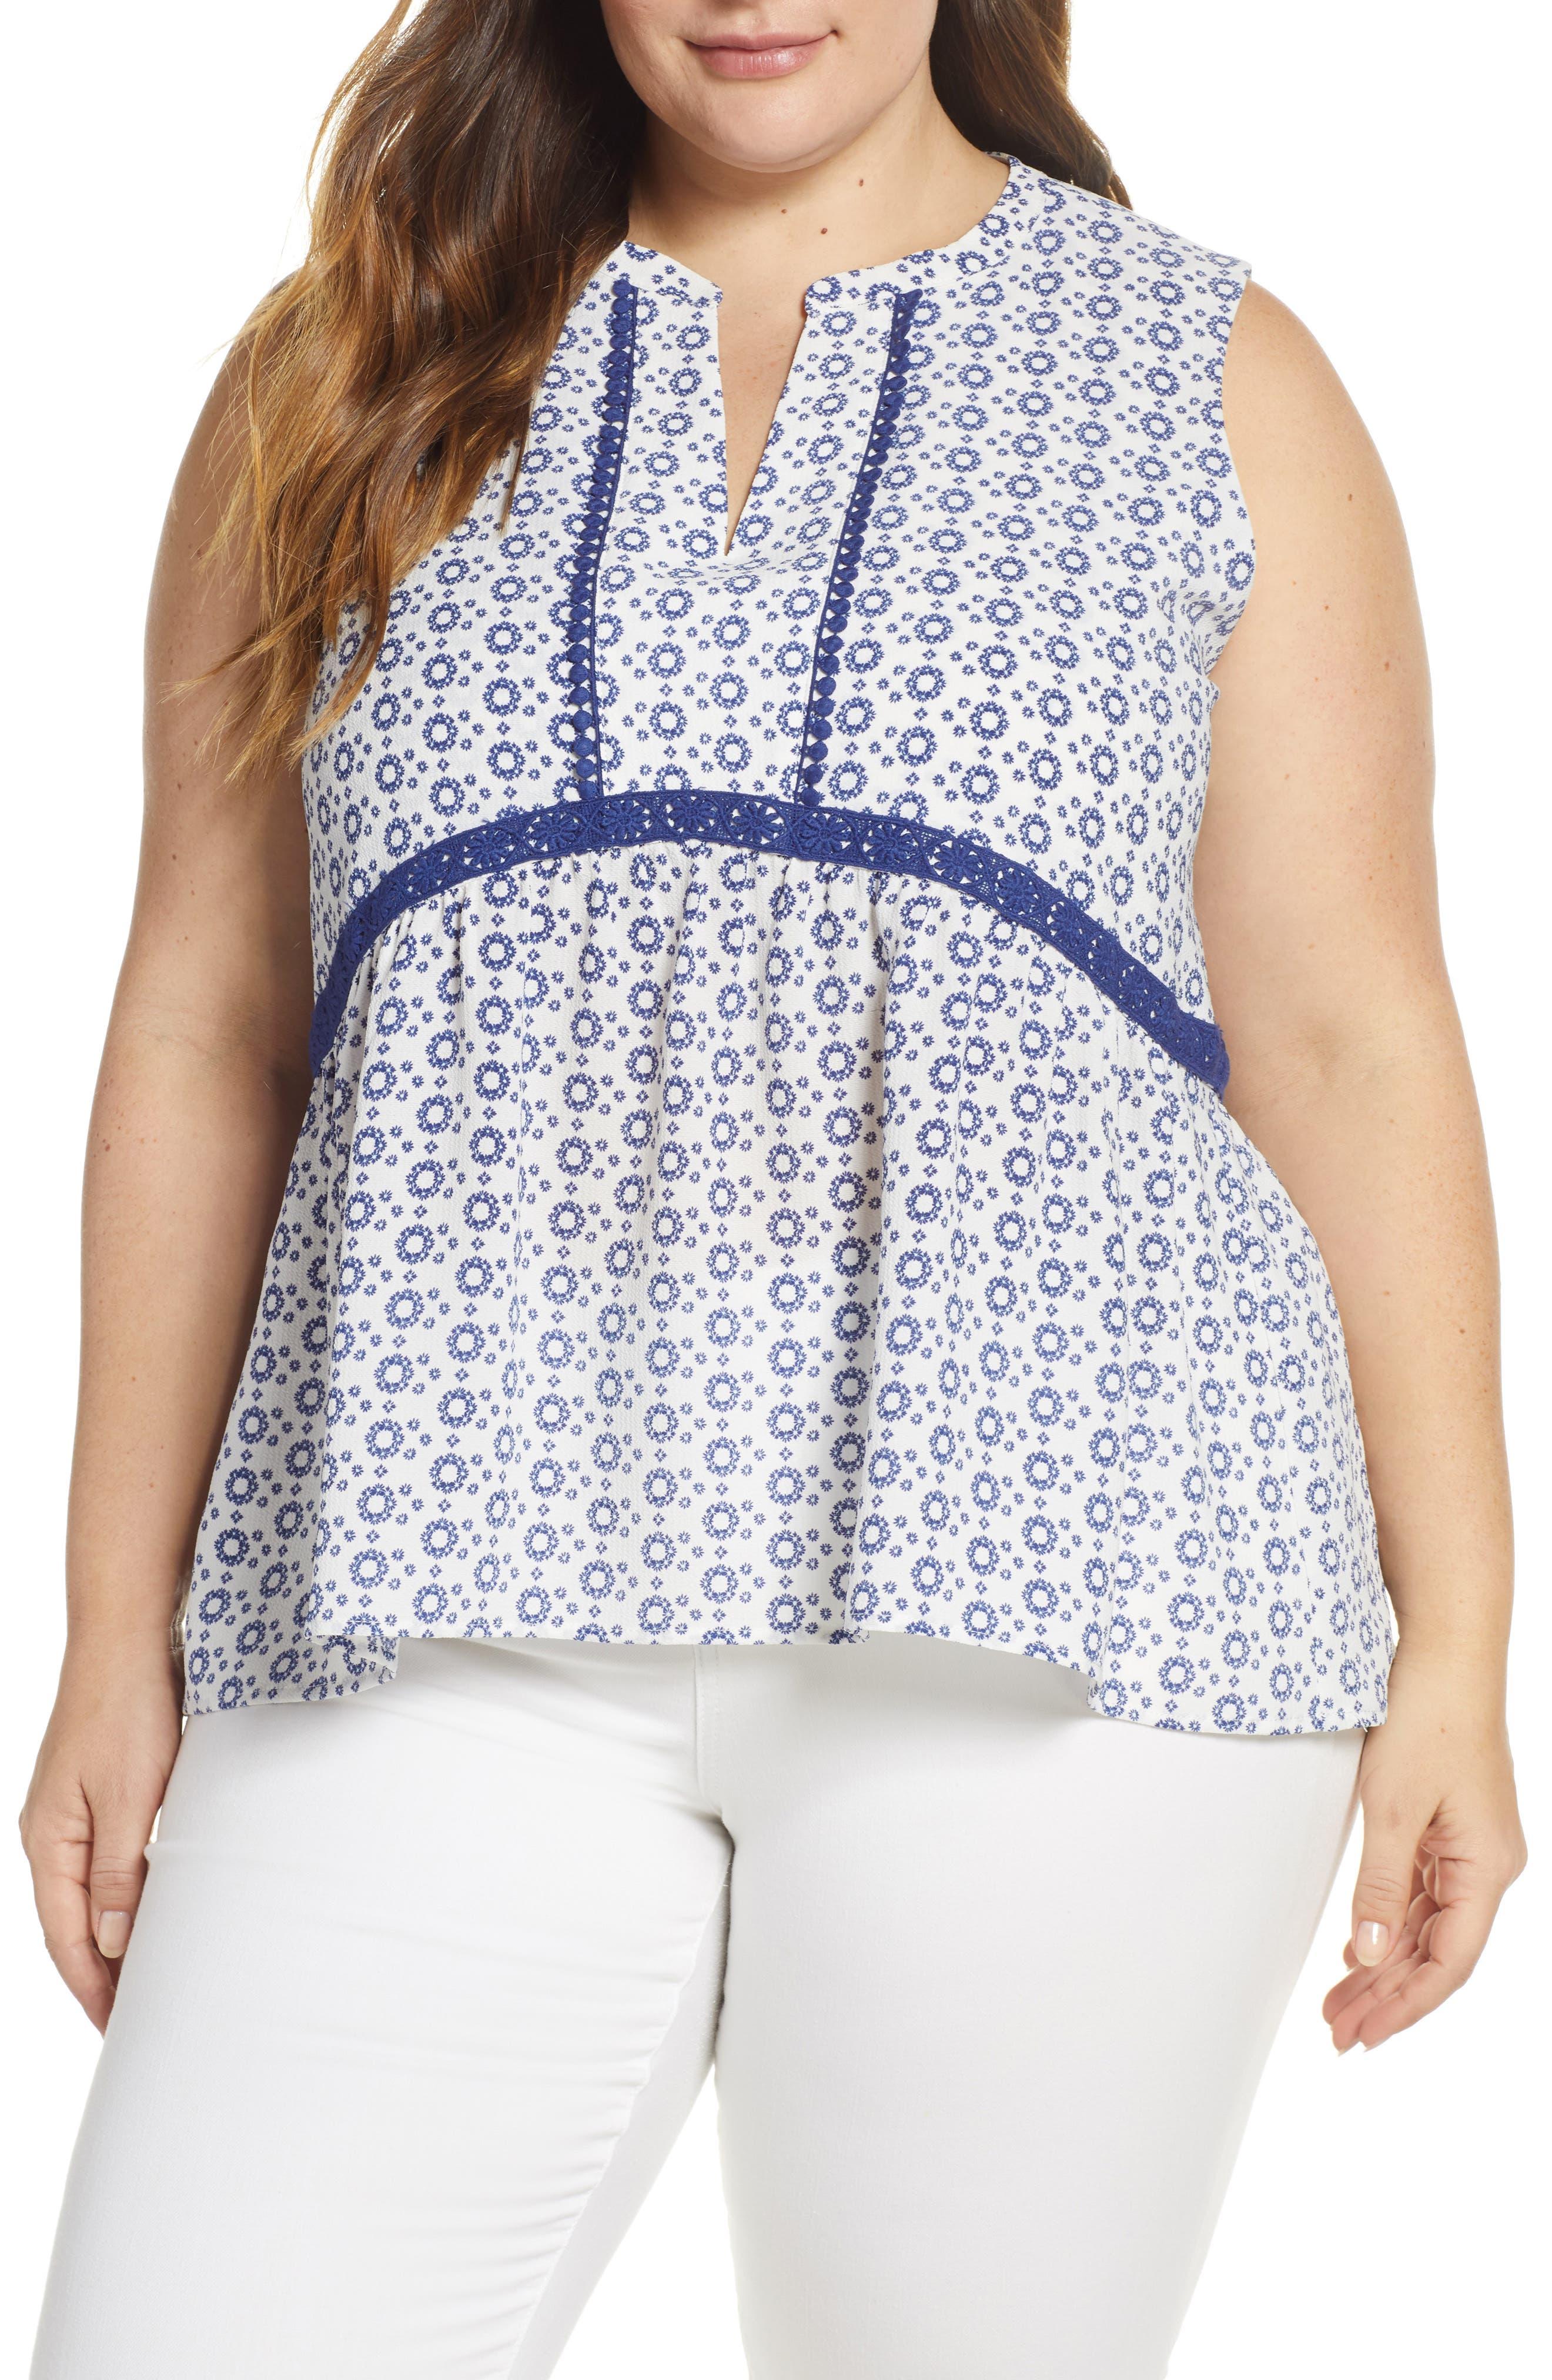 GIBSON, x International Women's Day Lindsey Crochet Detail Babydoll Blouse, Main thumbnail 1, color, WHITE/ NAVY GEO